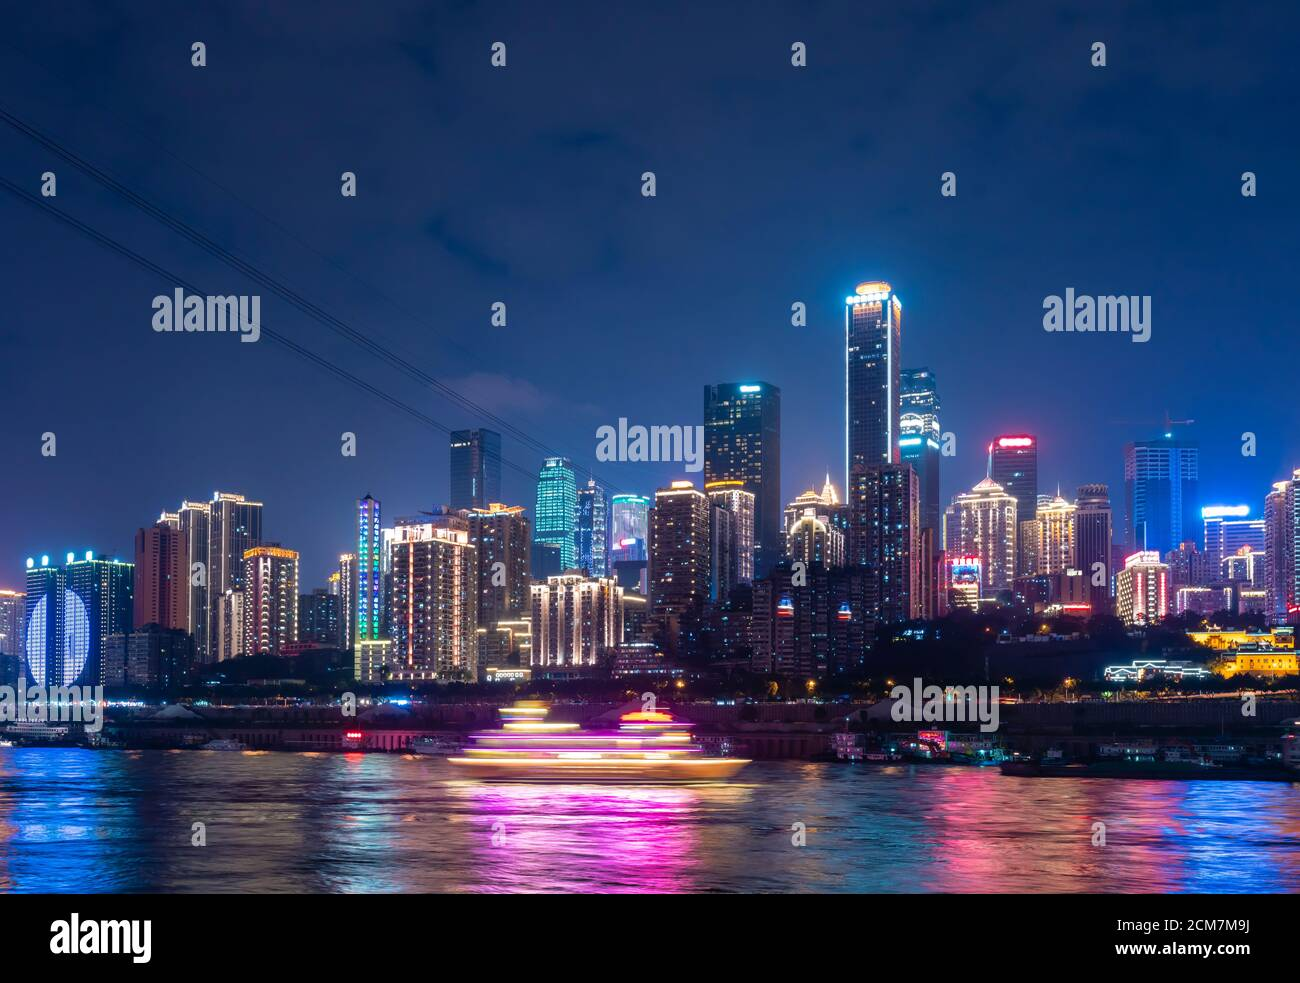 Chongqing city in China at night Stock Photo